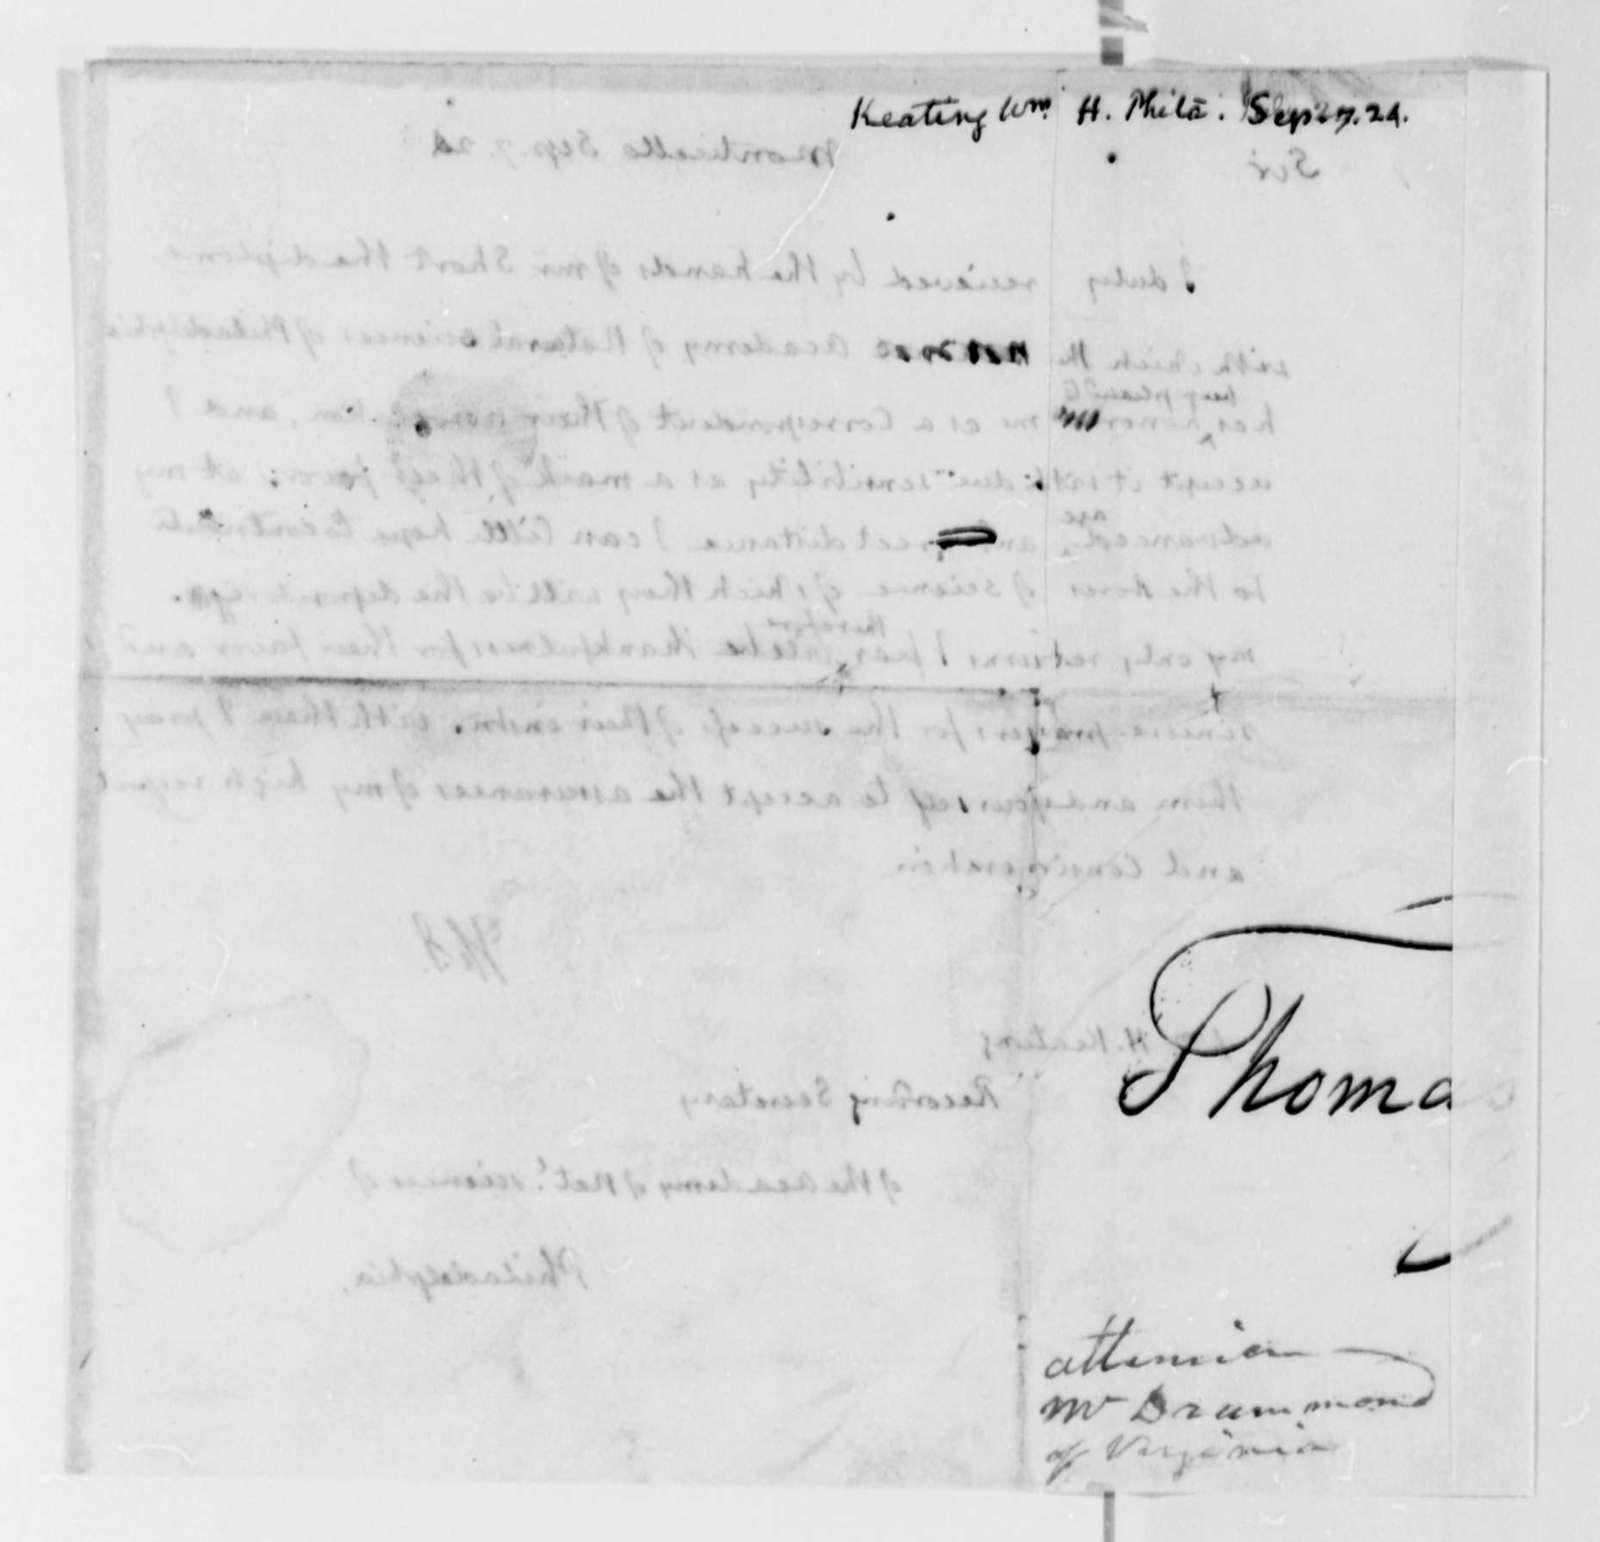 Thomas Jefferson to William H. Keating, September 7, 1824